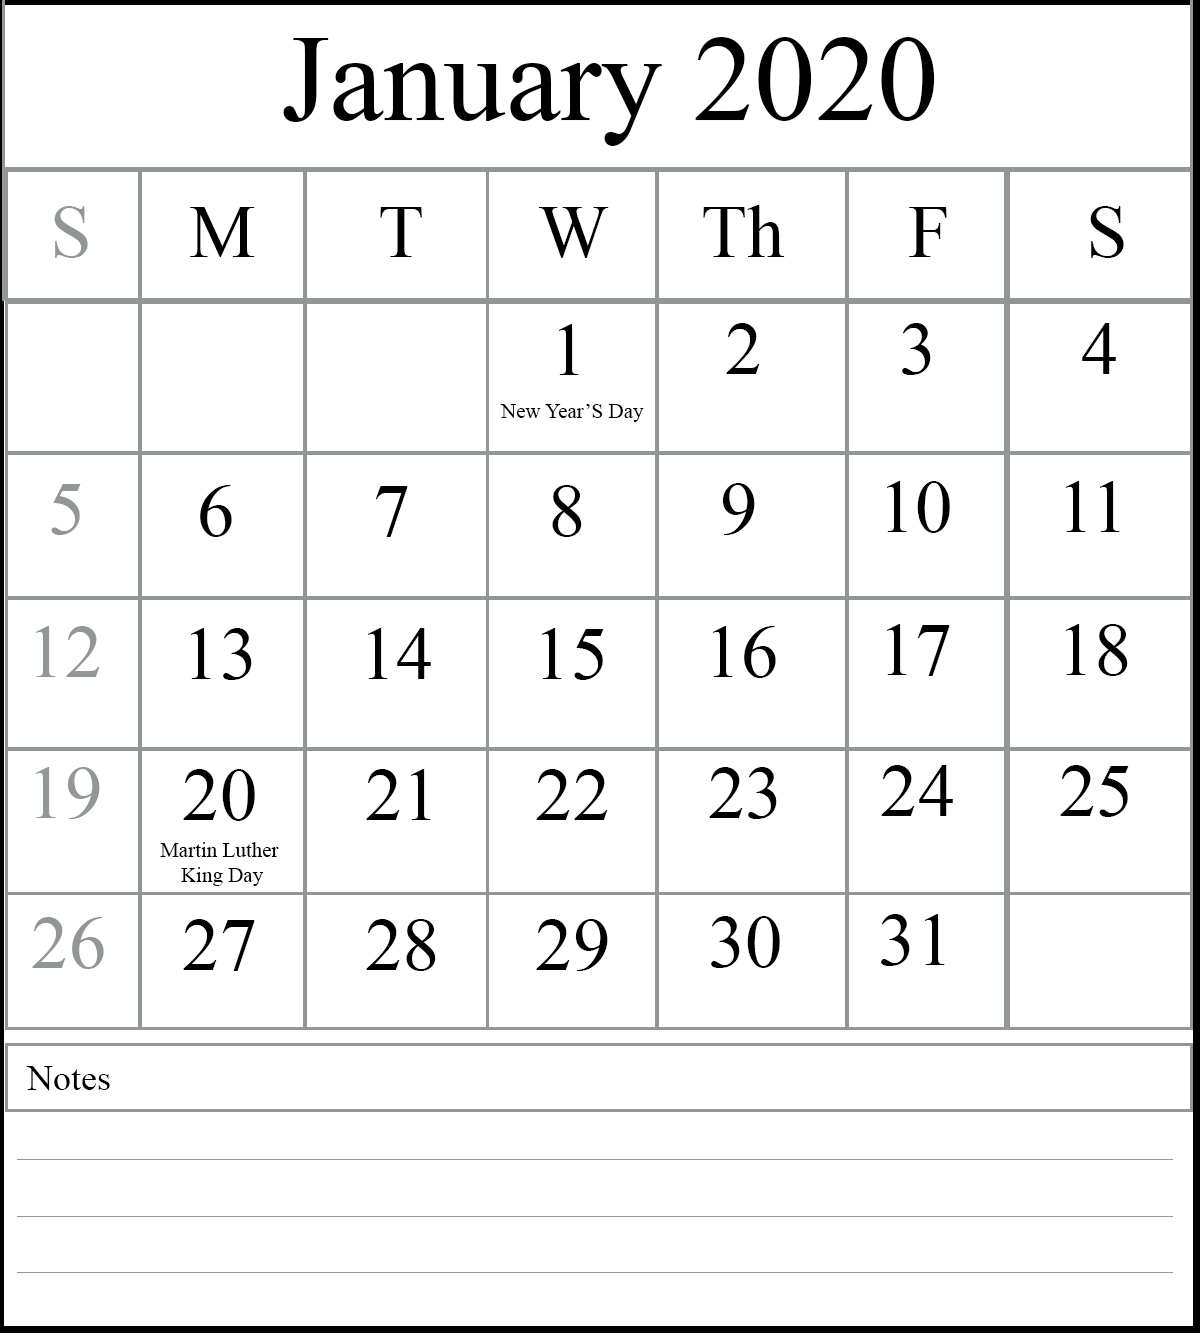 Free January And February 2020 Calendar Templates